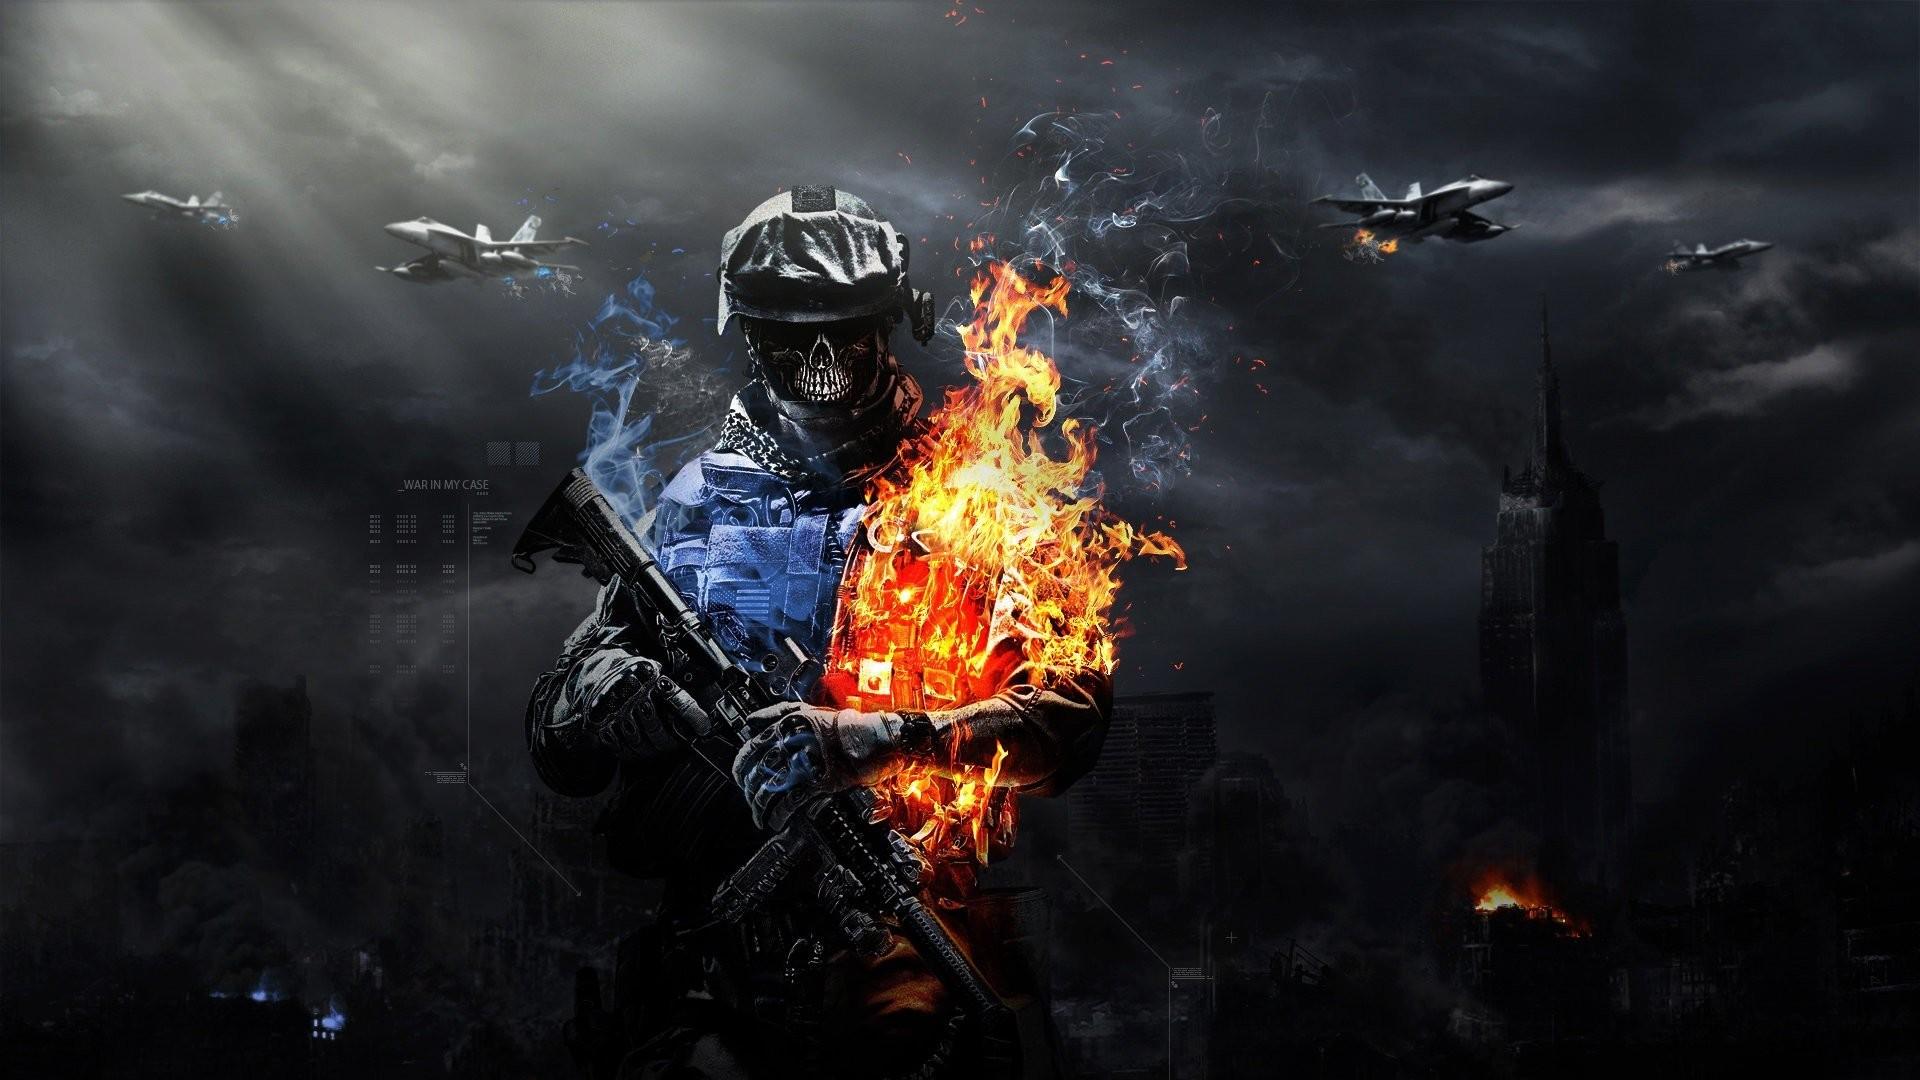 Artwork Battlefield 3 Buildings Explosions Flames Jet Aircraft Skulls  Soldiers War